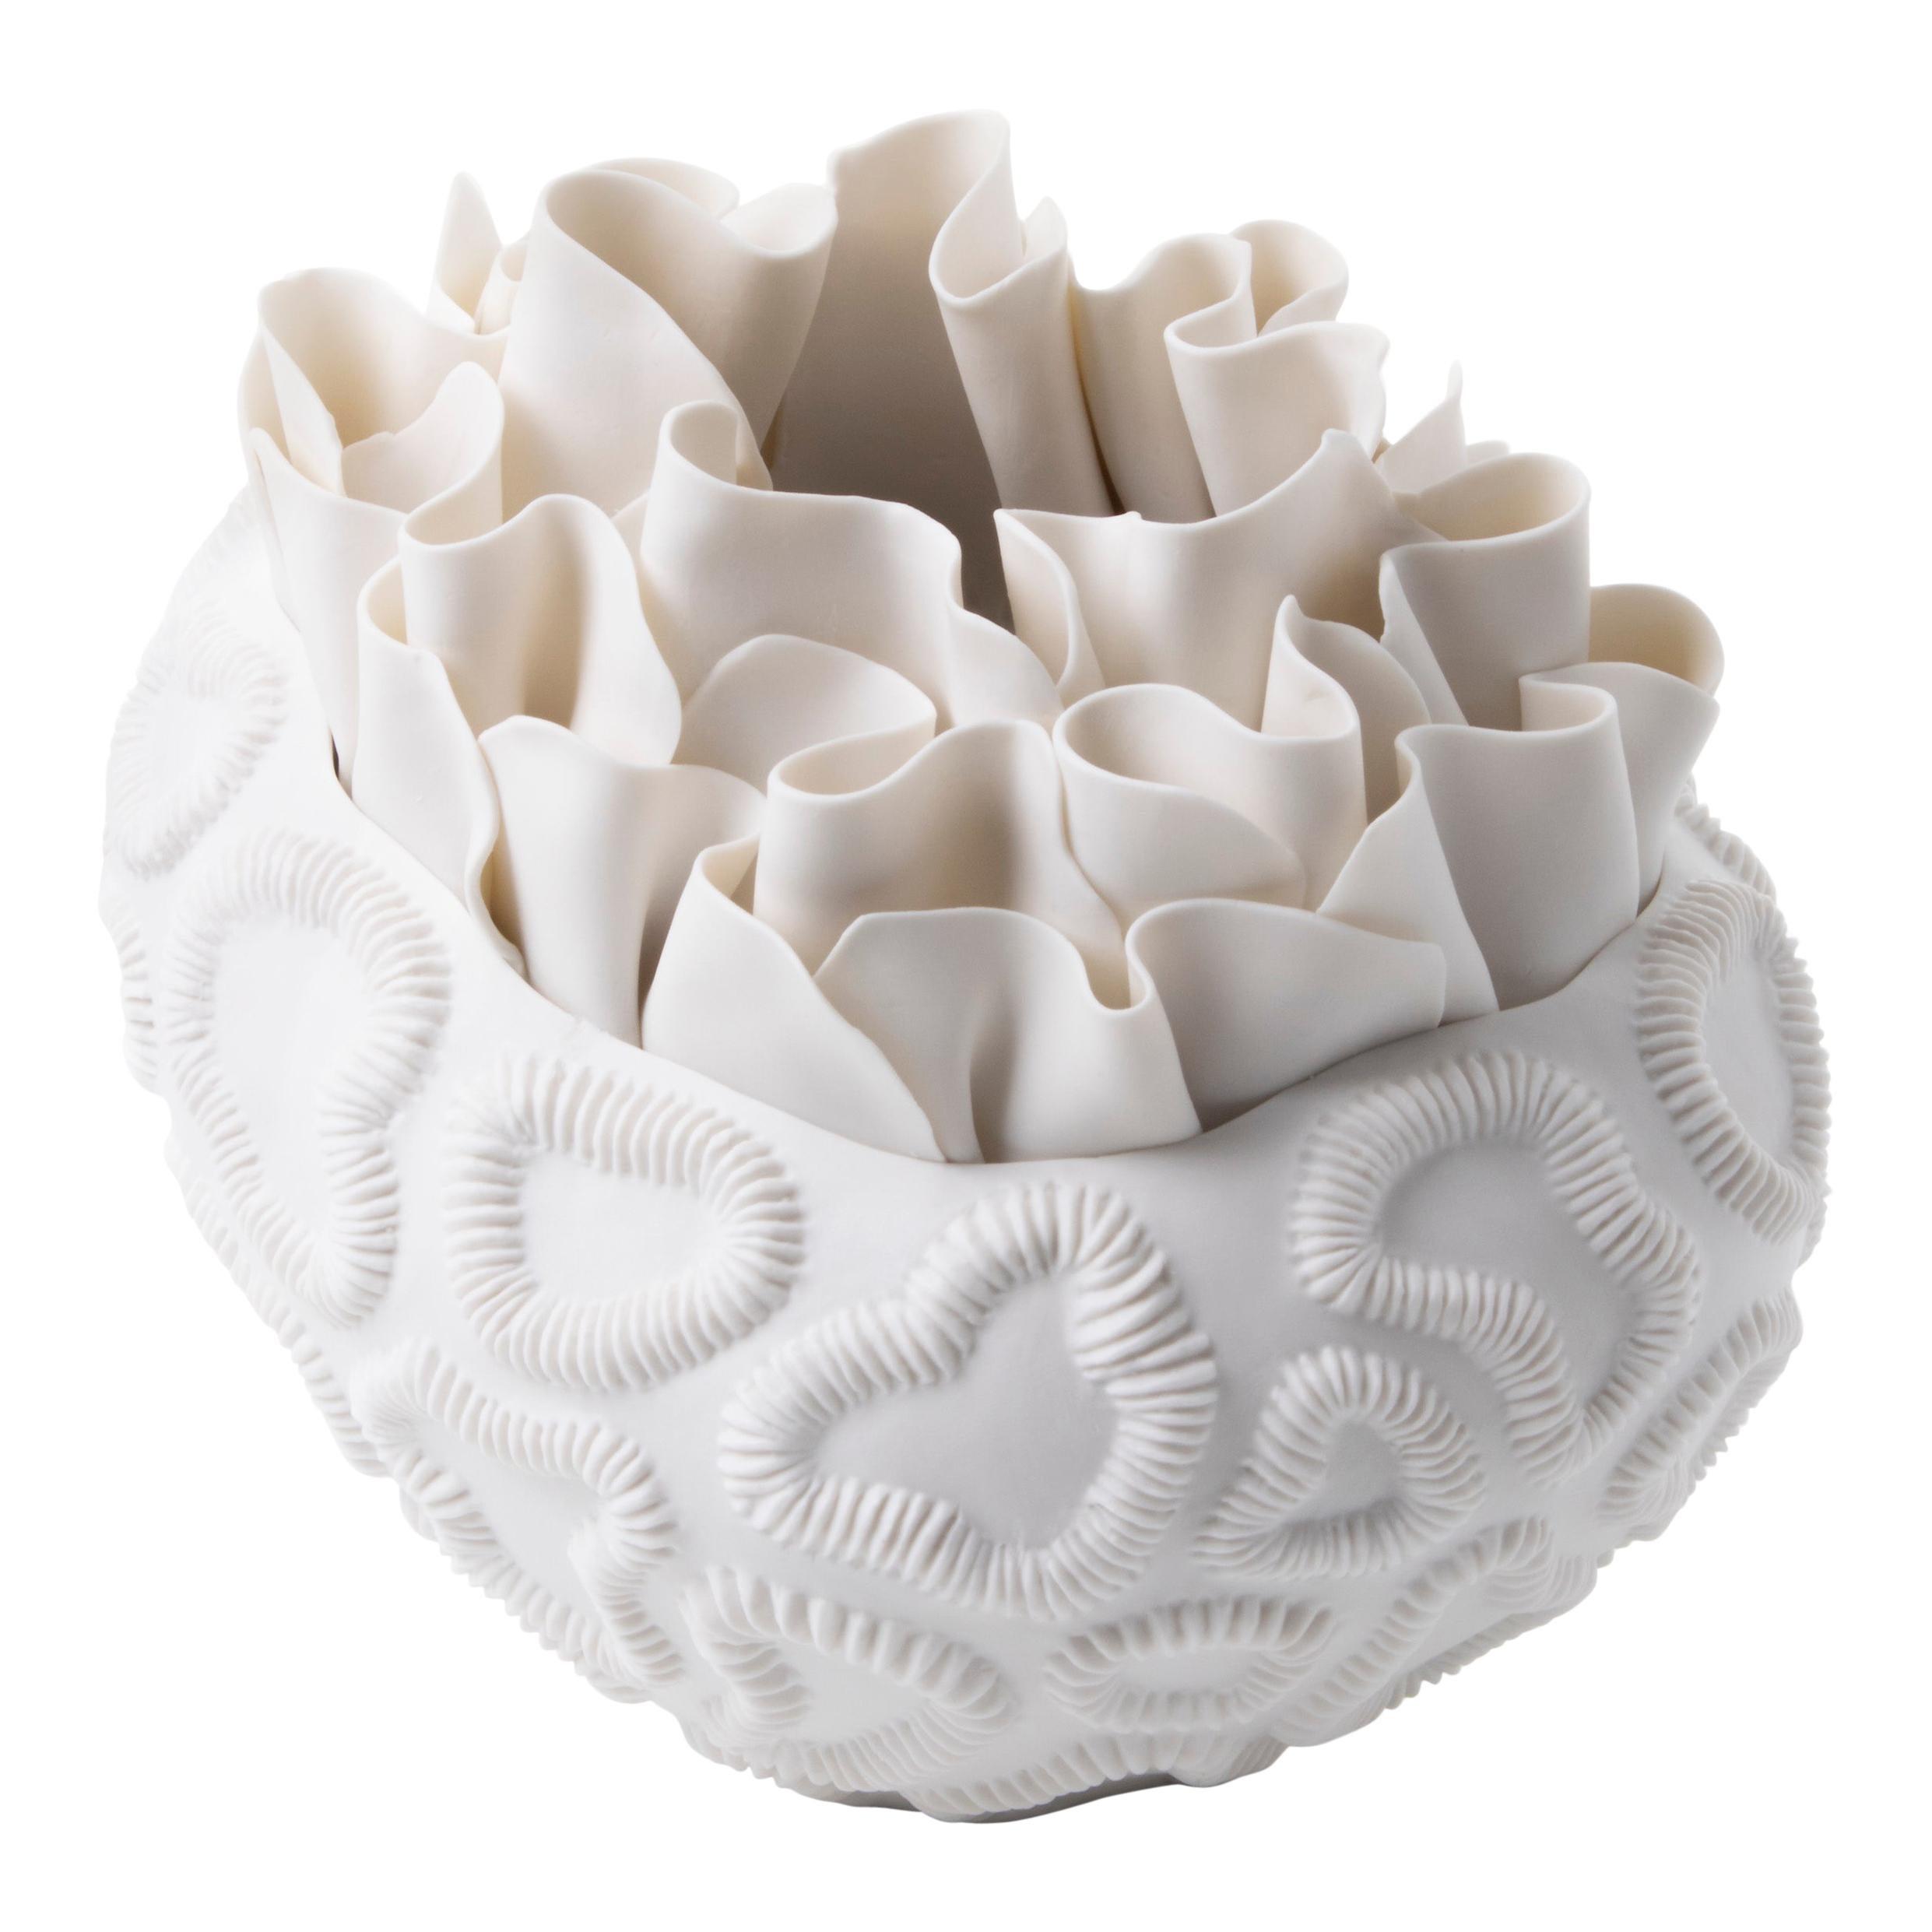 Contemporary Porcelain White Sculpture Sea Coral Natural Handmade Ceramic Fos